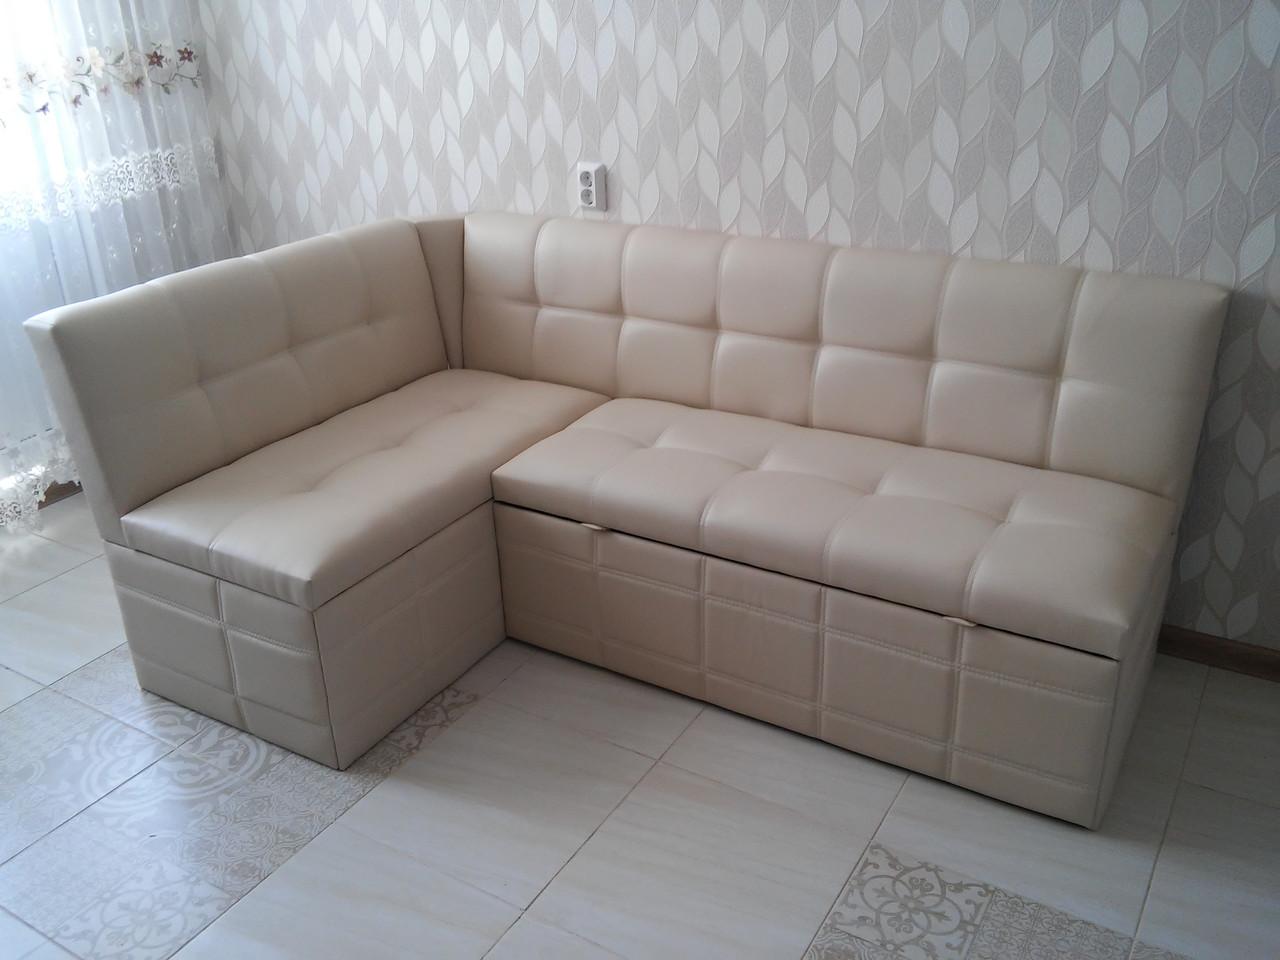 собрать мягкий диван